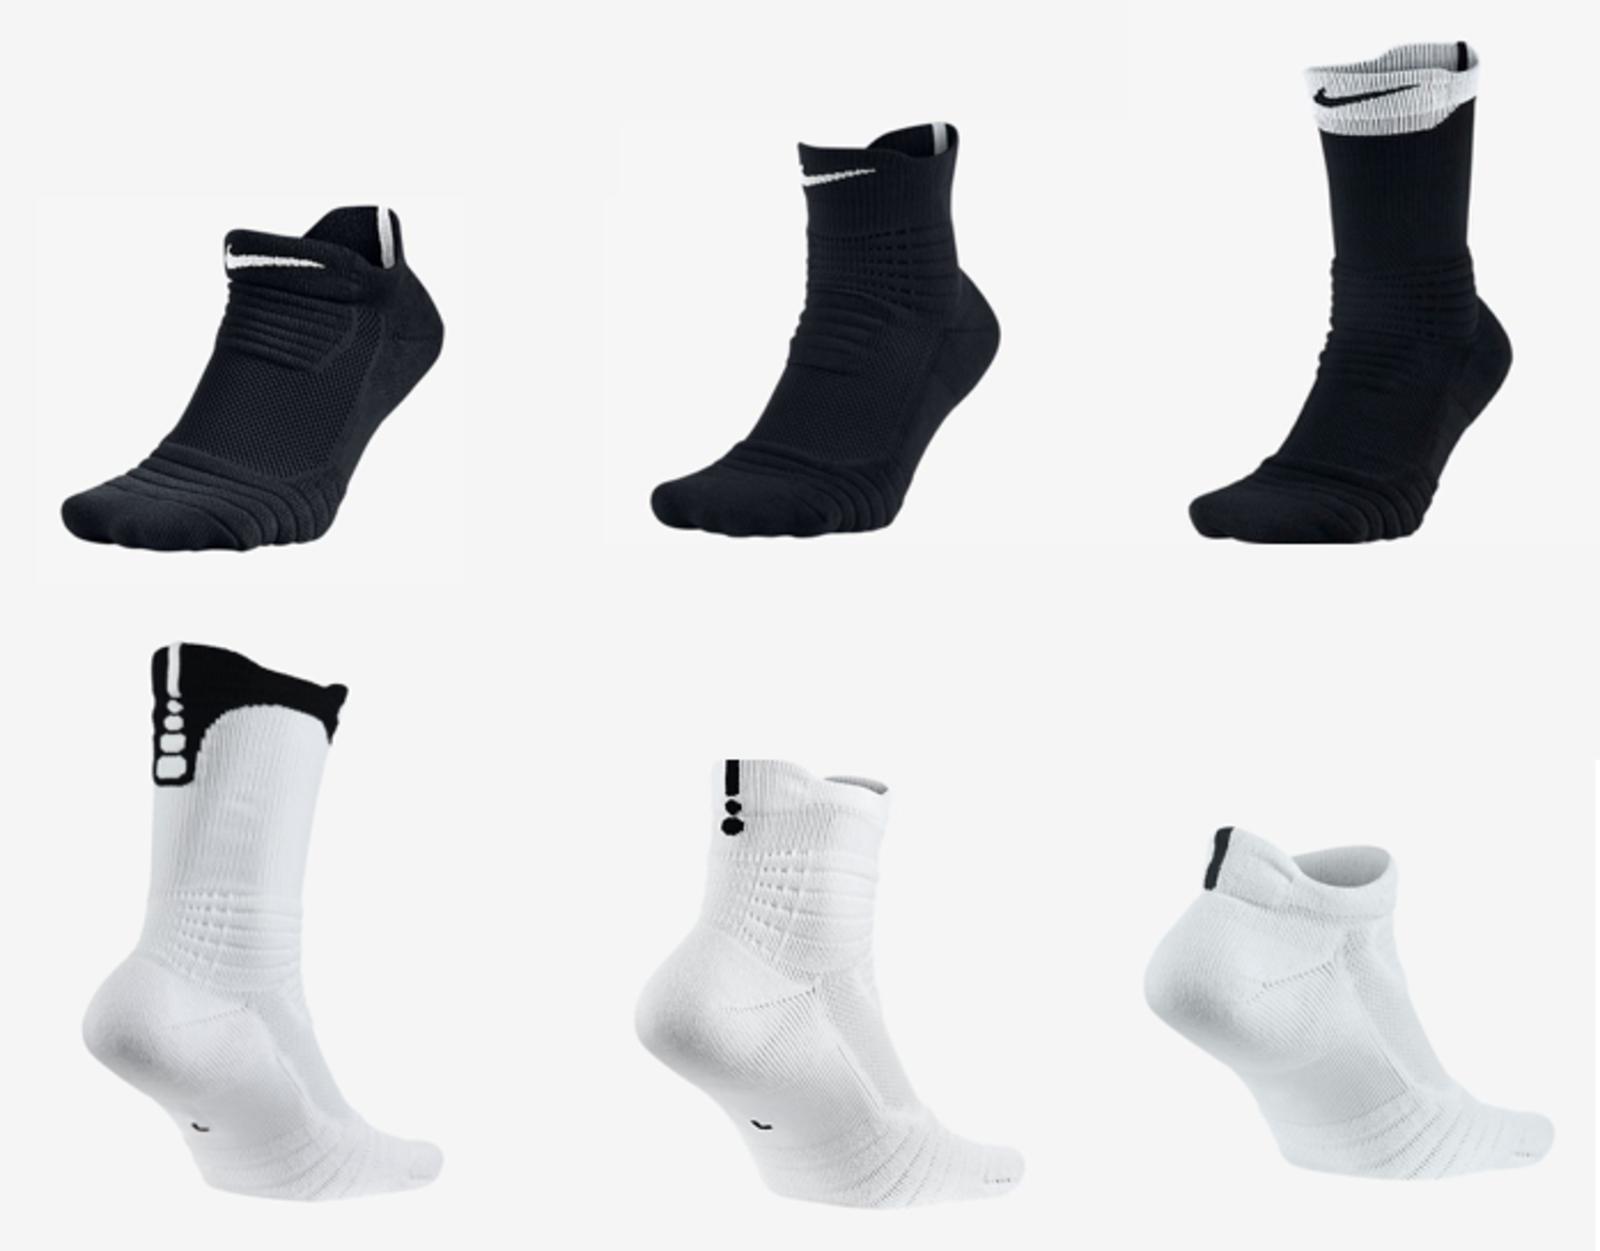 2016 Nike Elite Versatility Socks